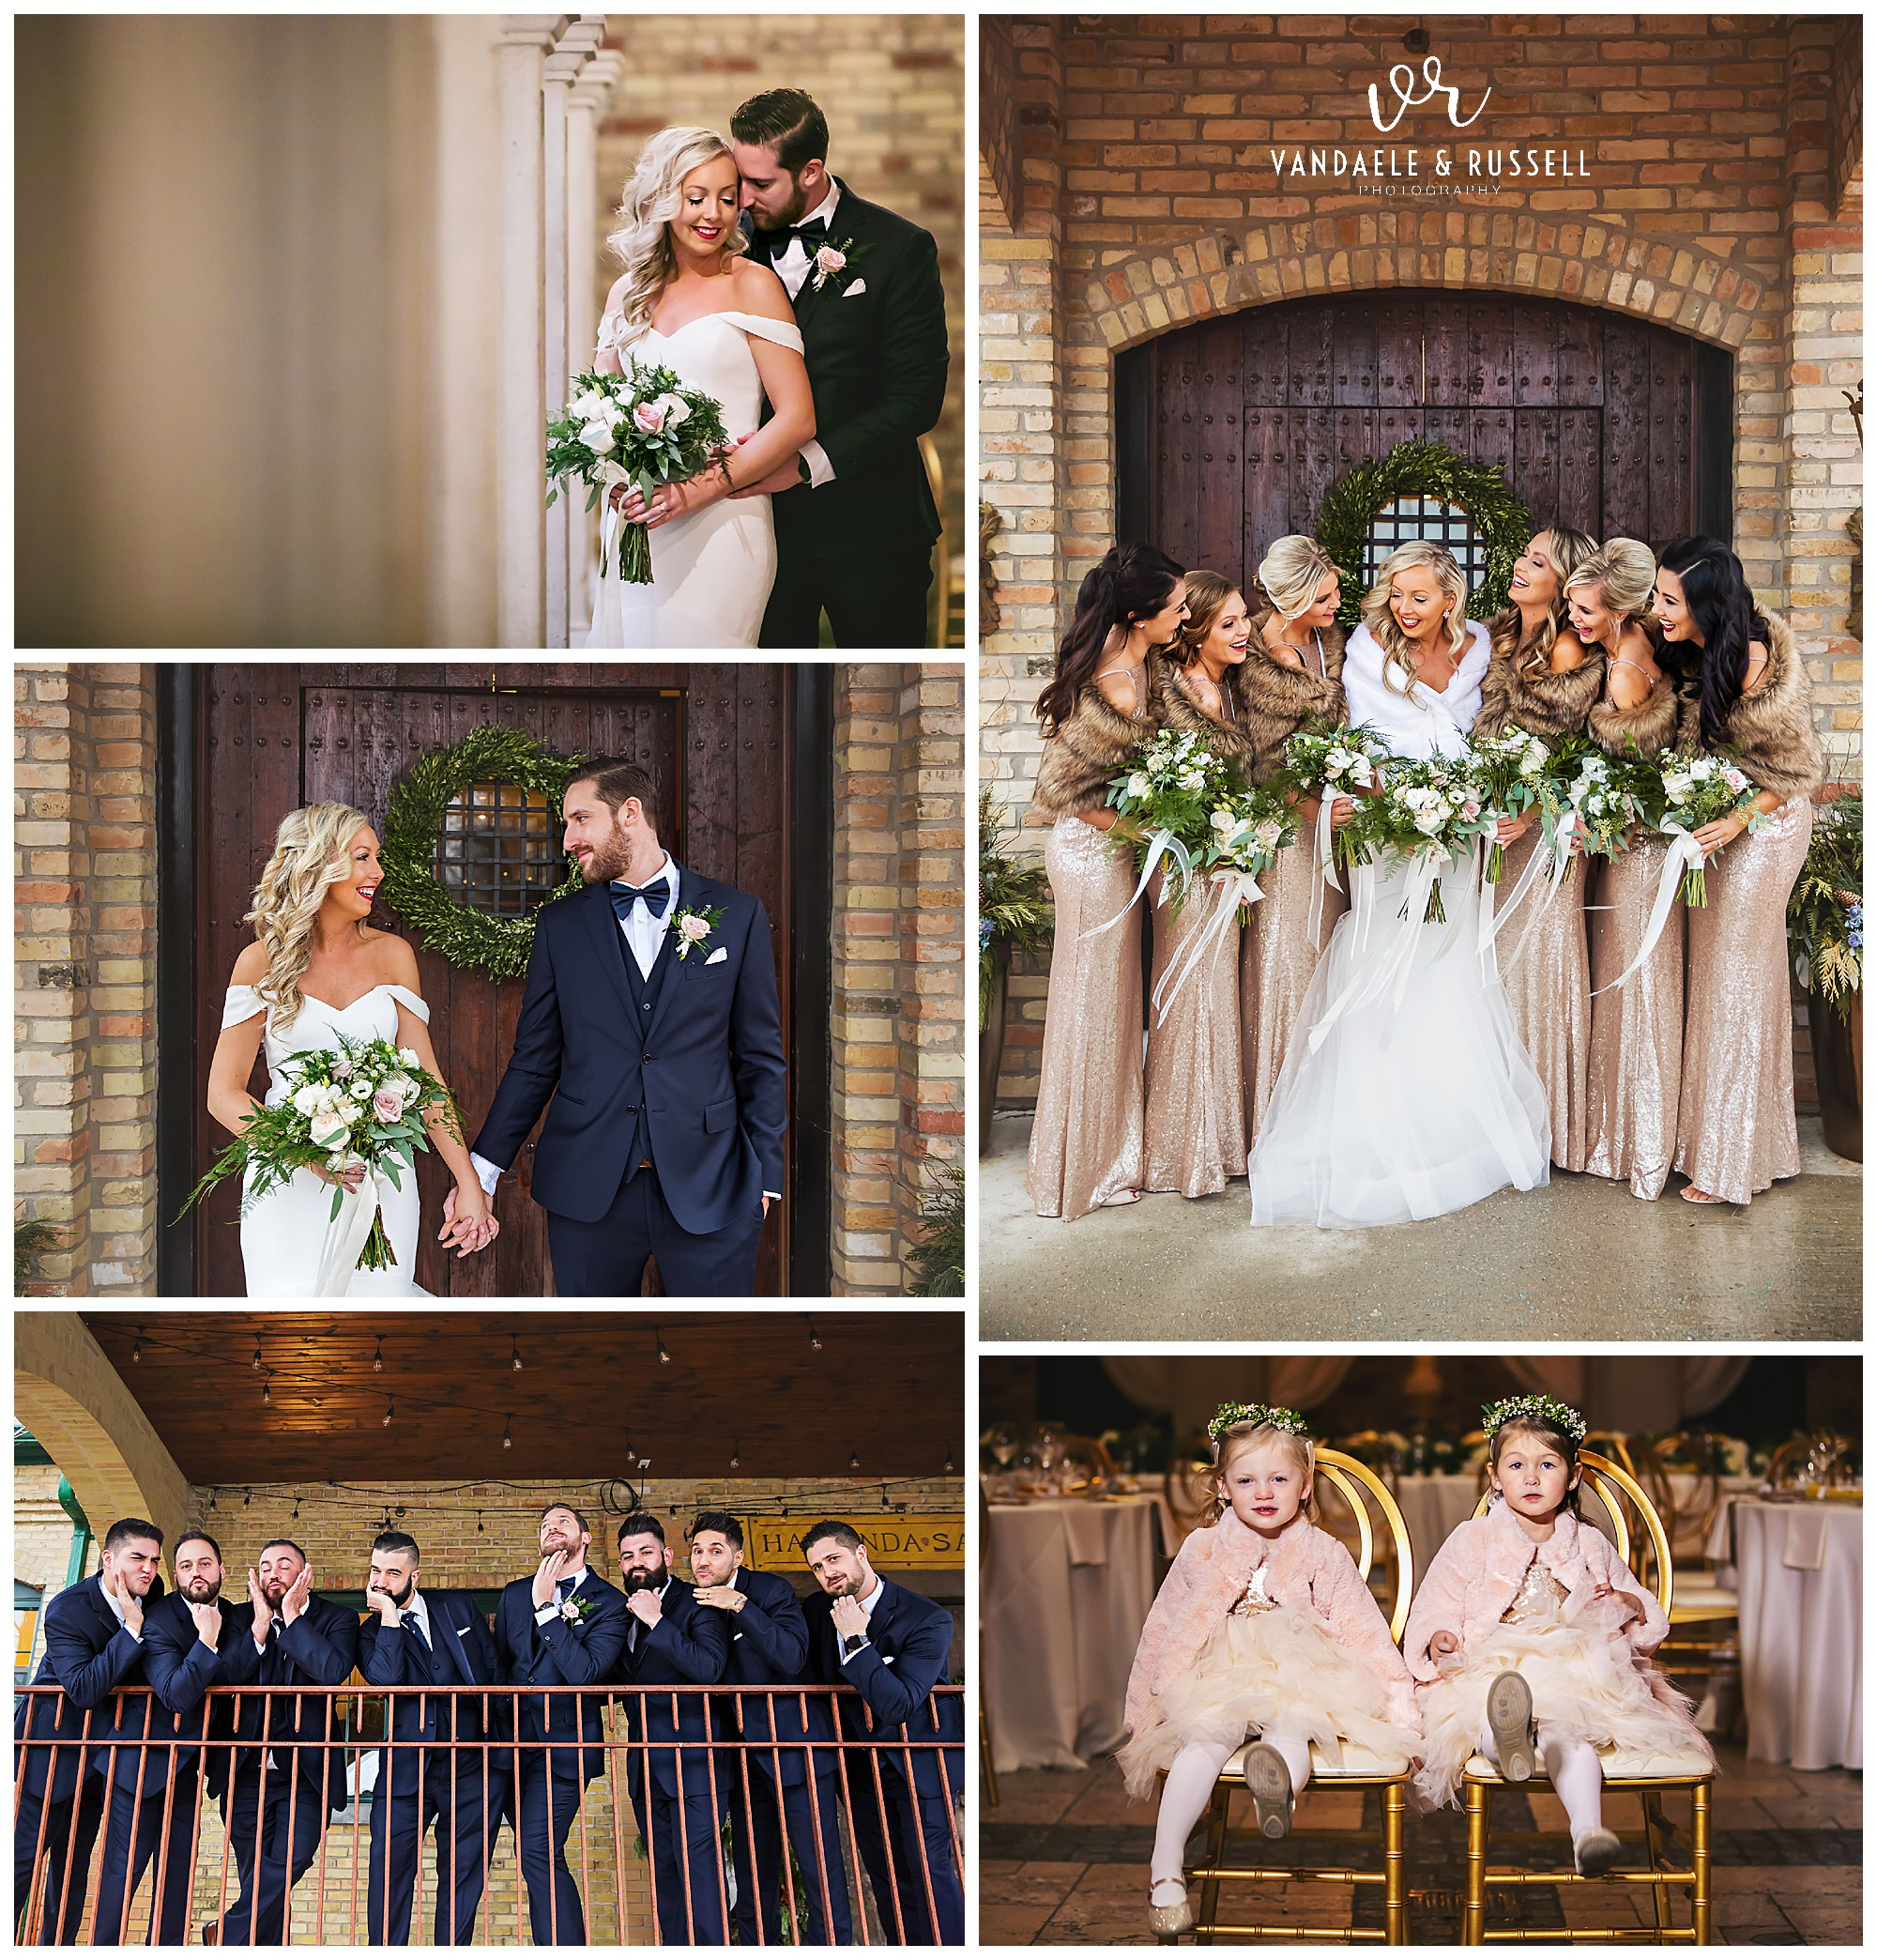 Hacienda-Sarria-Wedding-Photos-NYE-Michelle-Matt-VanDaele-Russell_0015.jpg